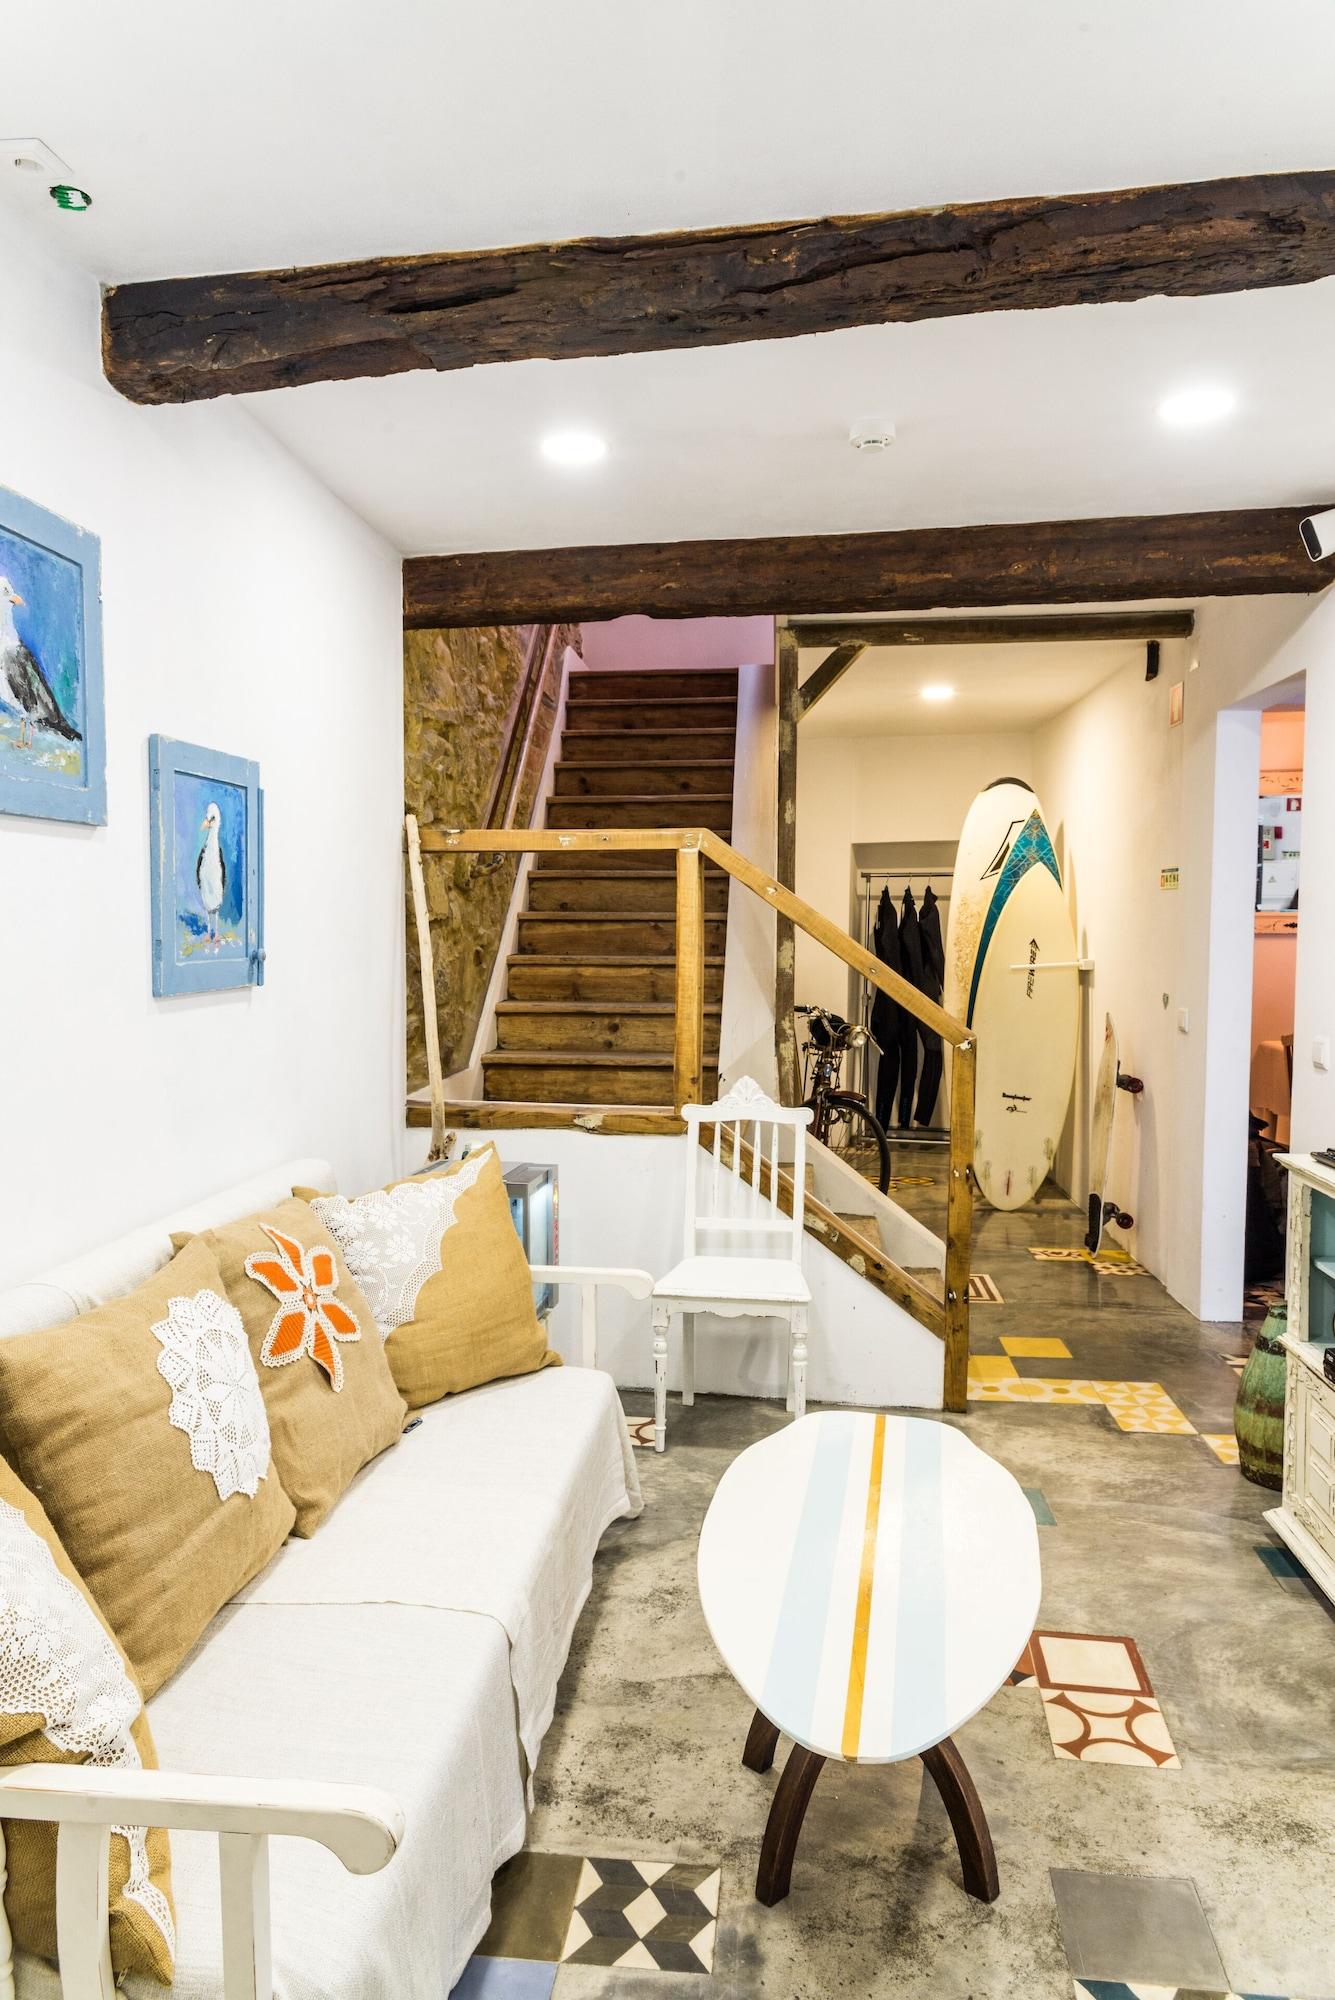 The Surf Embassy Hostel, Peniche